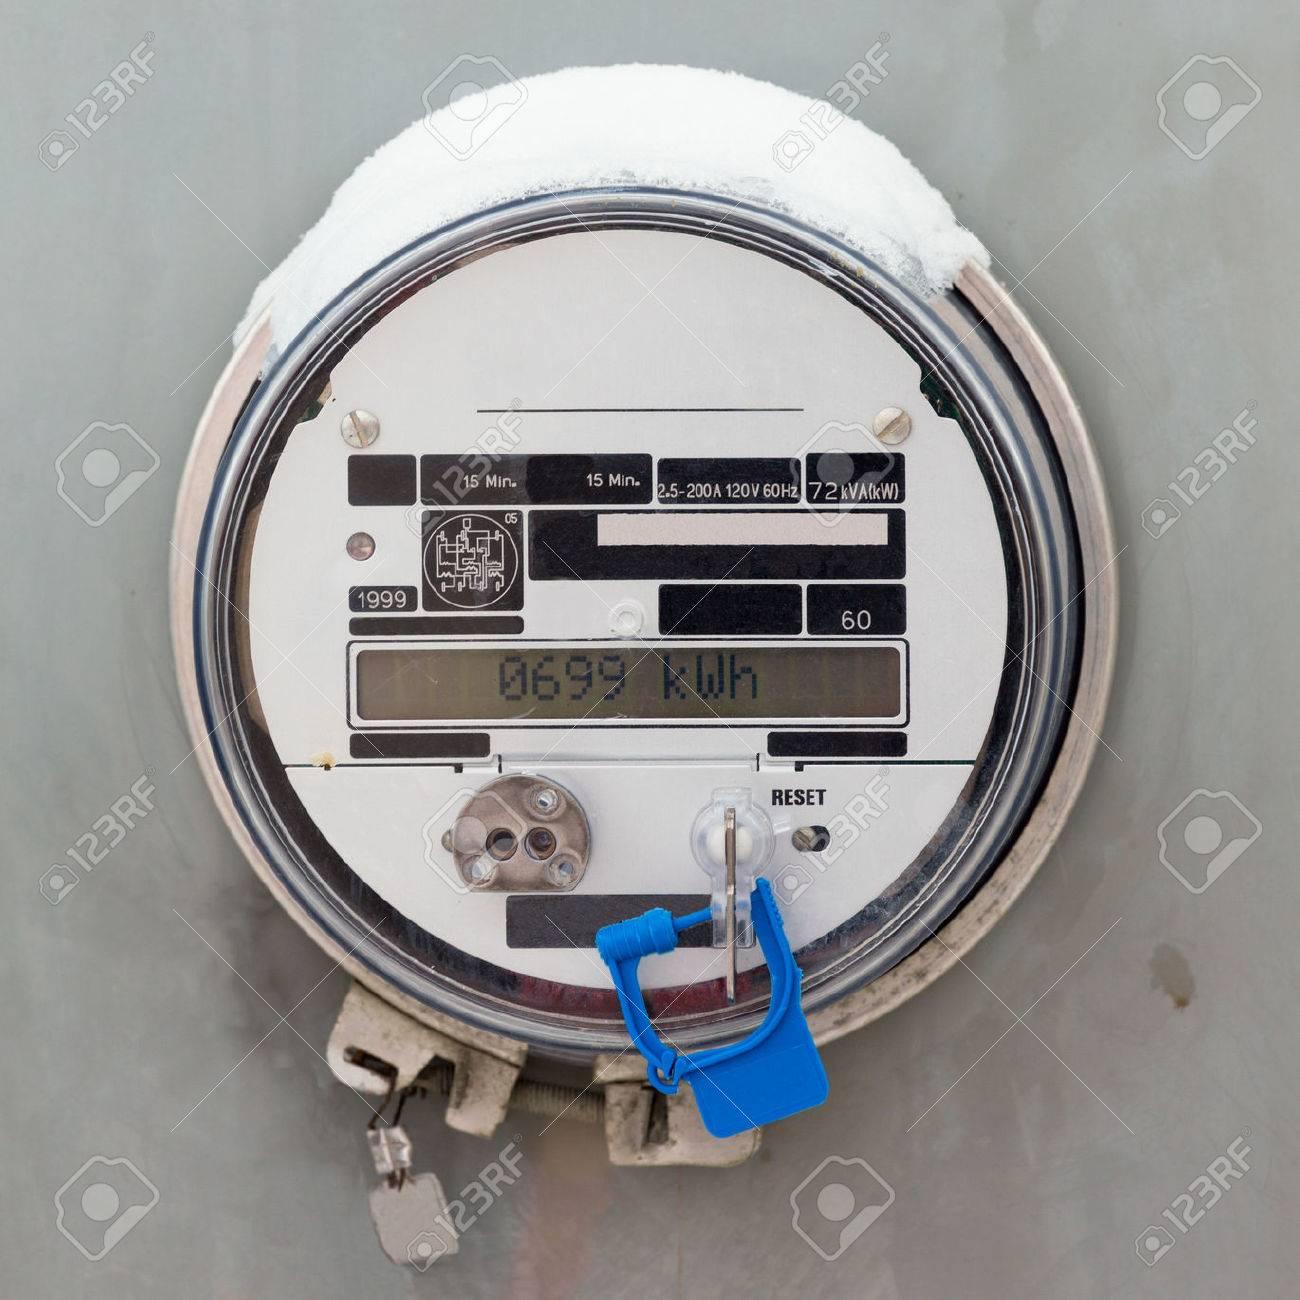 Modern smart grid residential digital power supply meter displays kilowatthours of consumed electric energy Stock Photo - 24443337